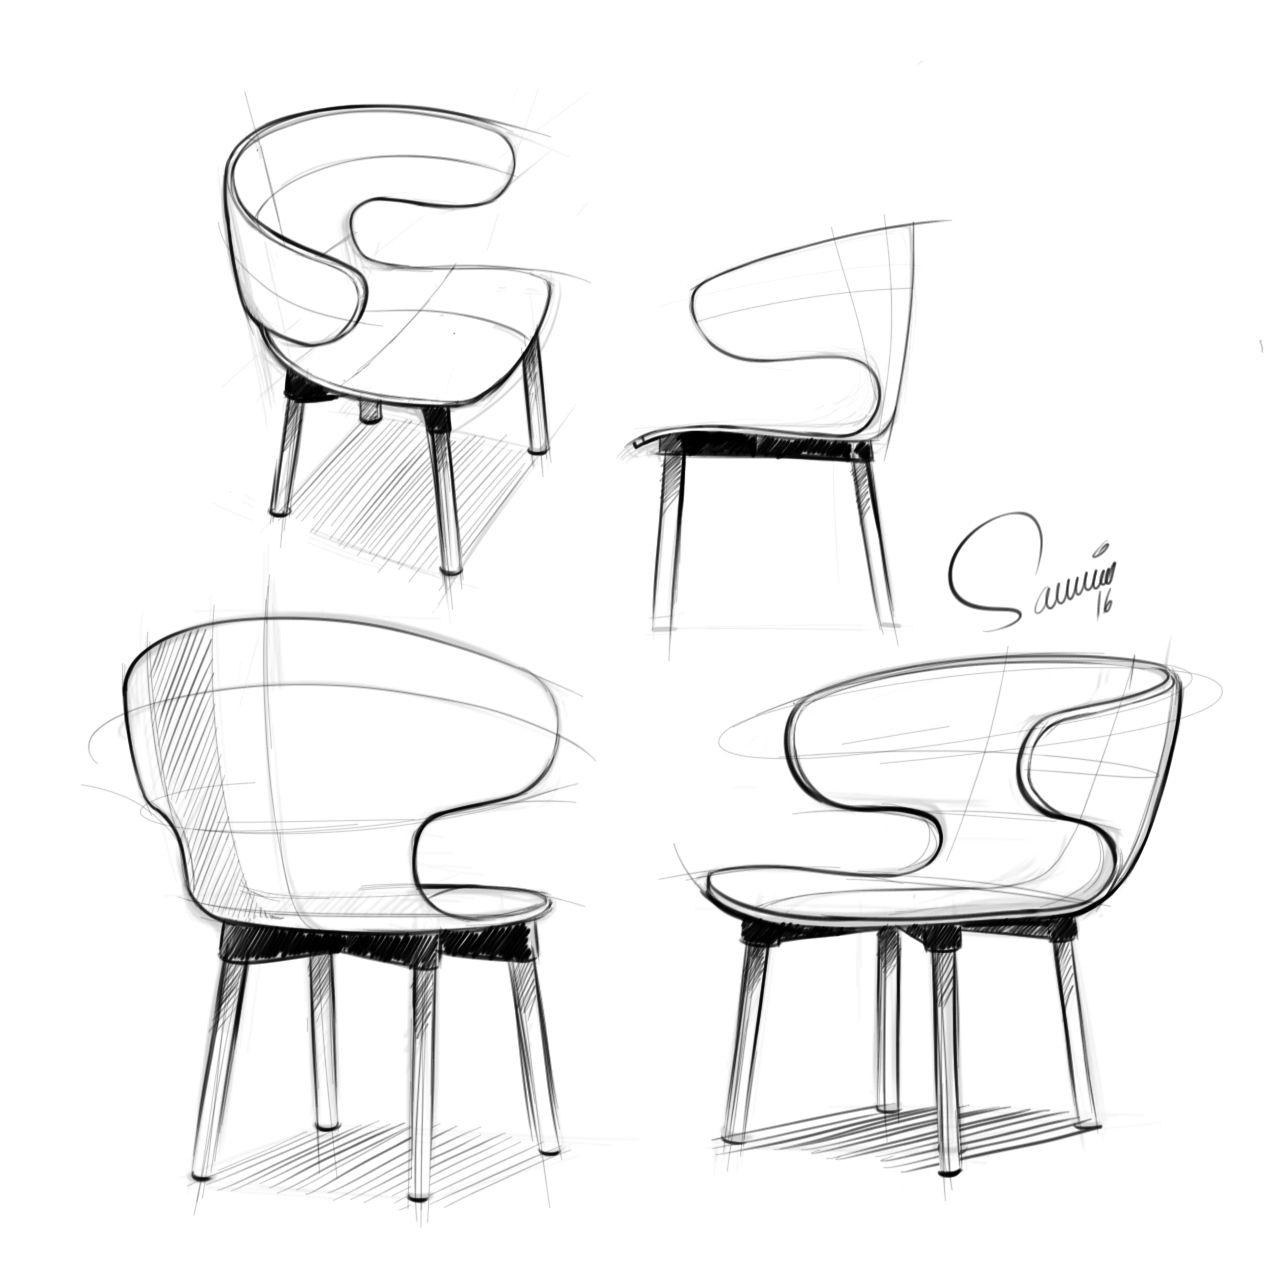 Industrial design sketches furniture - Furniture Design Sketches